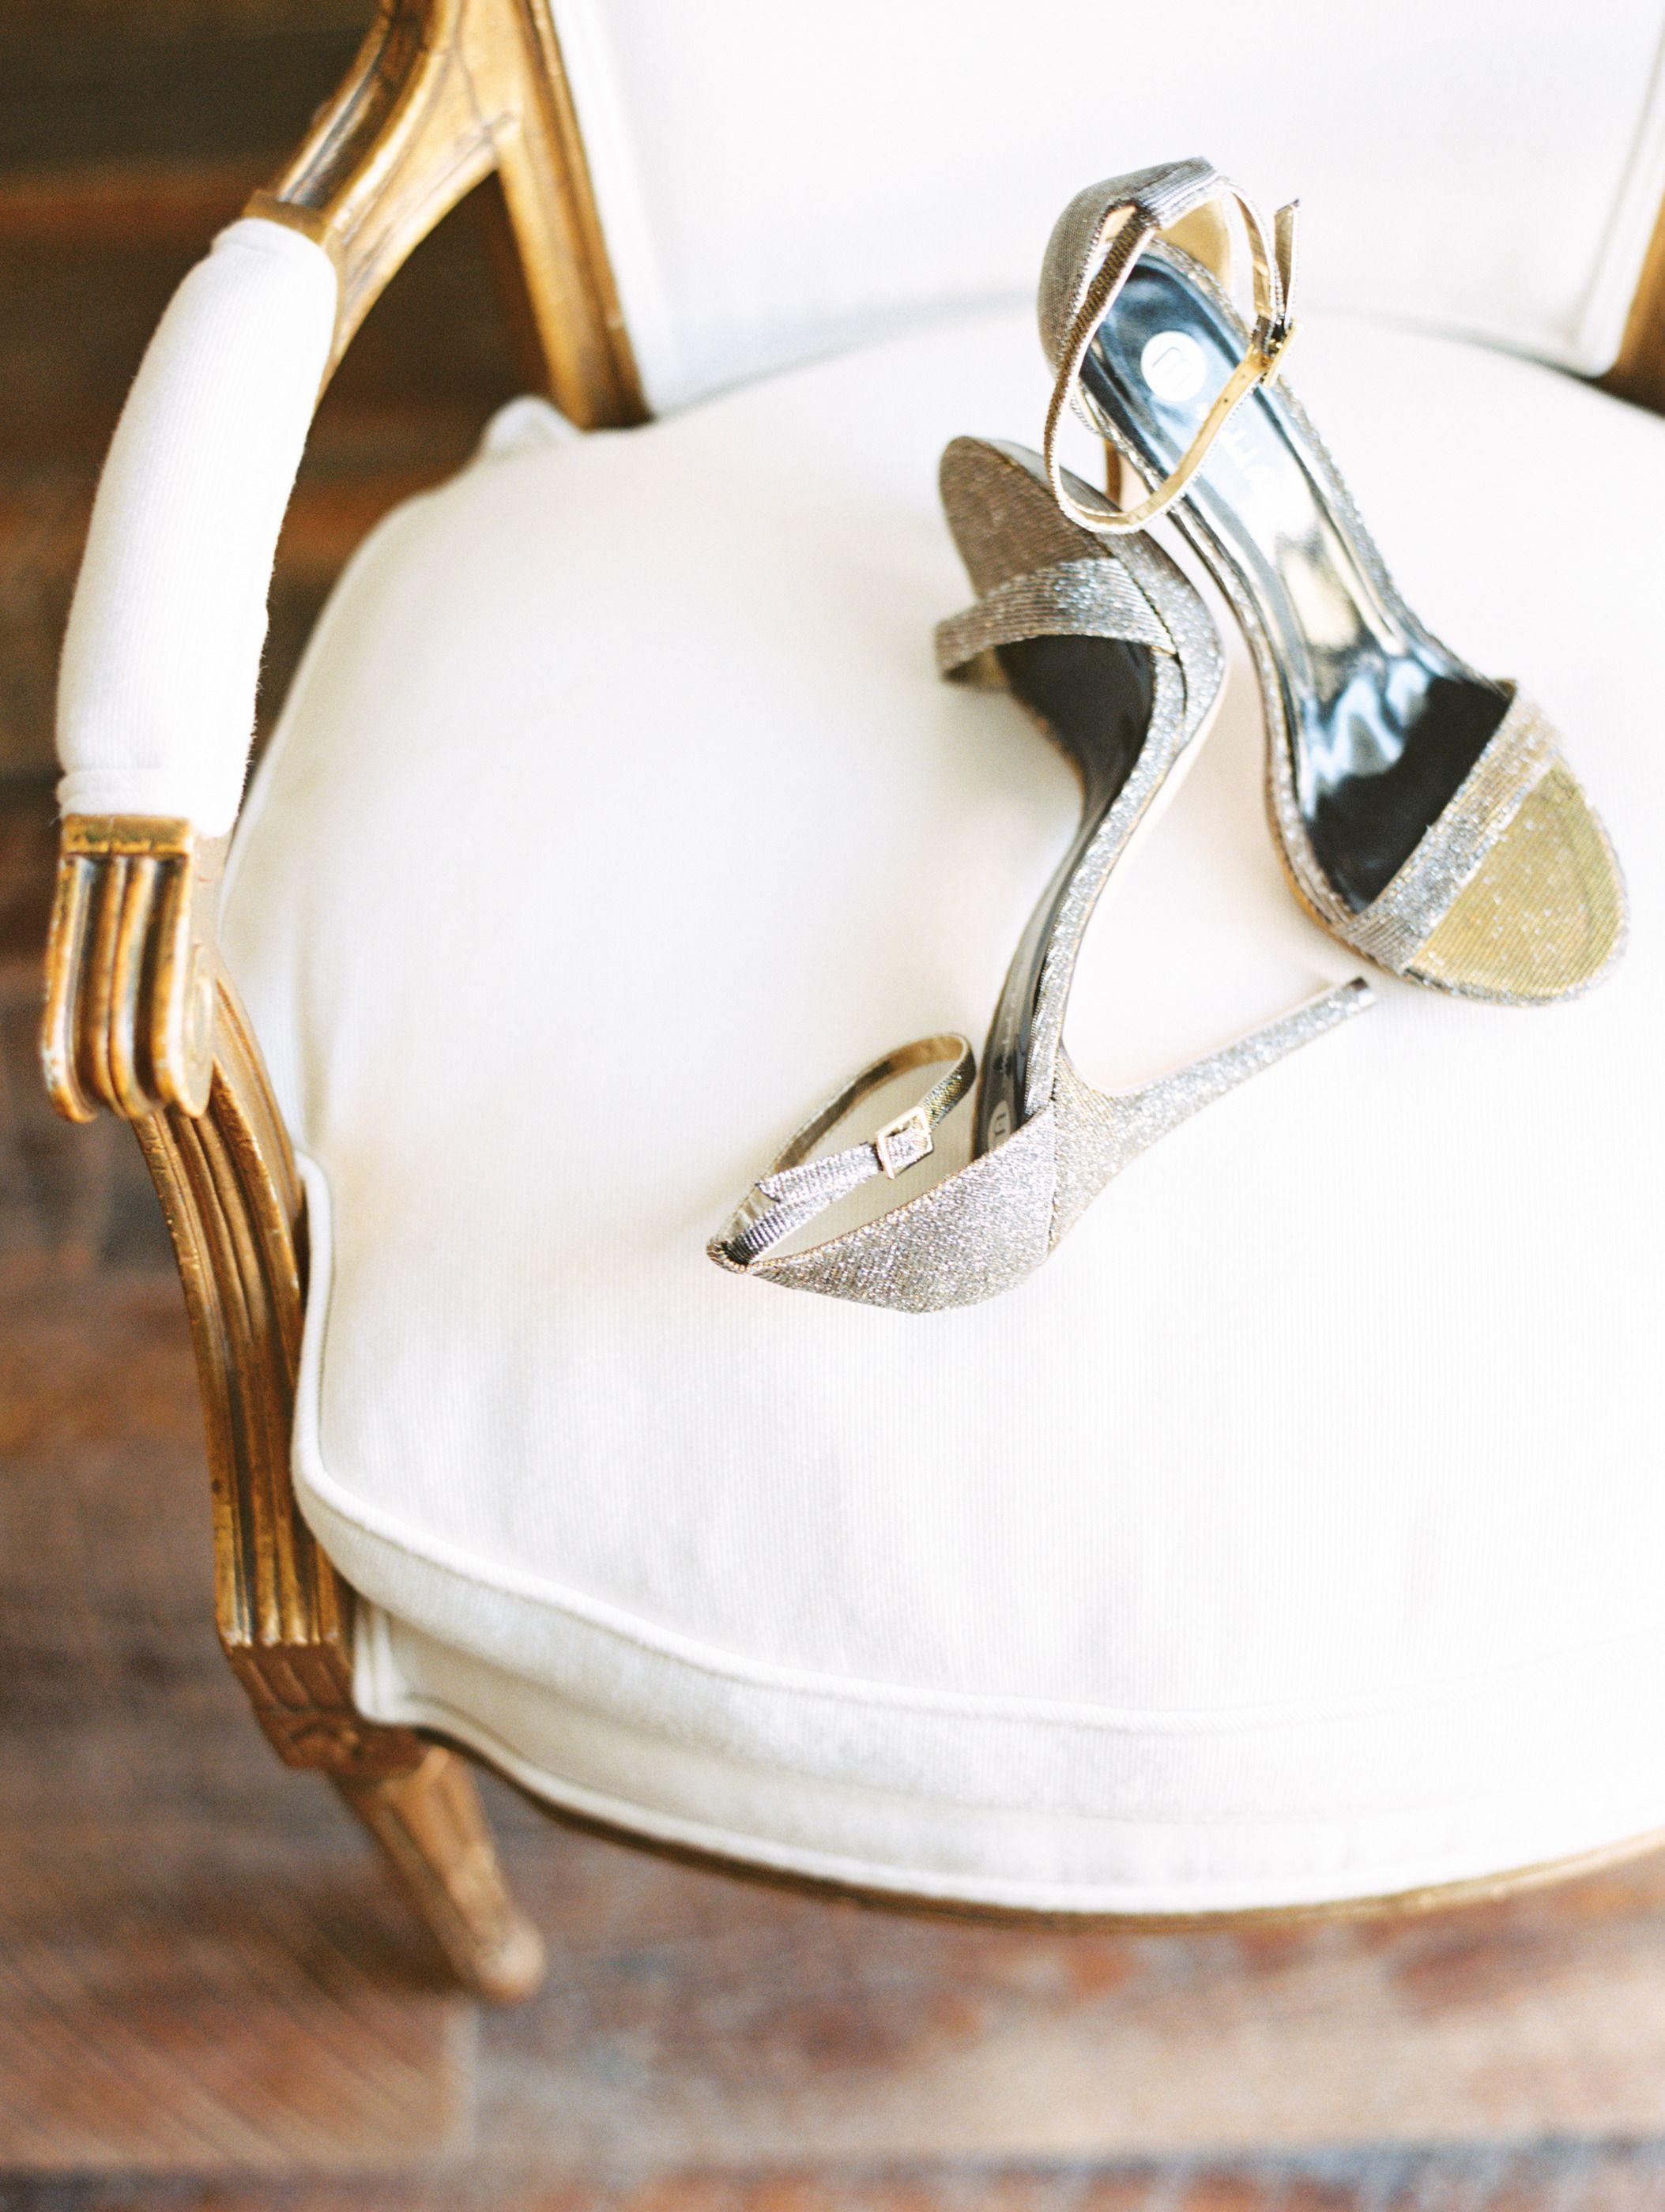 Pin by Veronica Benites on Fashion   Shoes, Wedding shoe